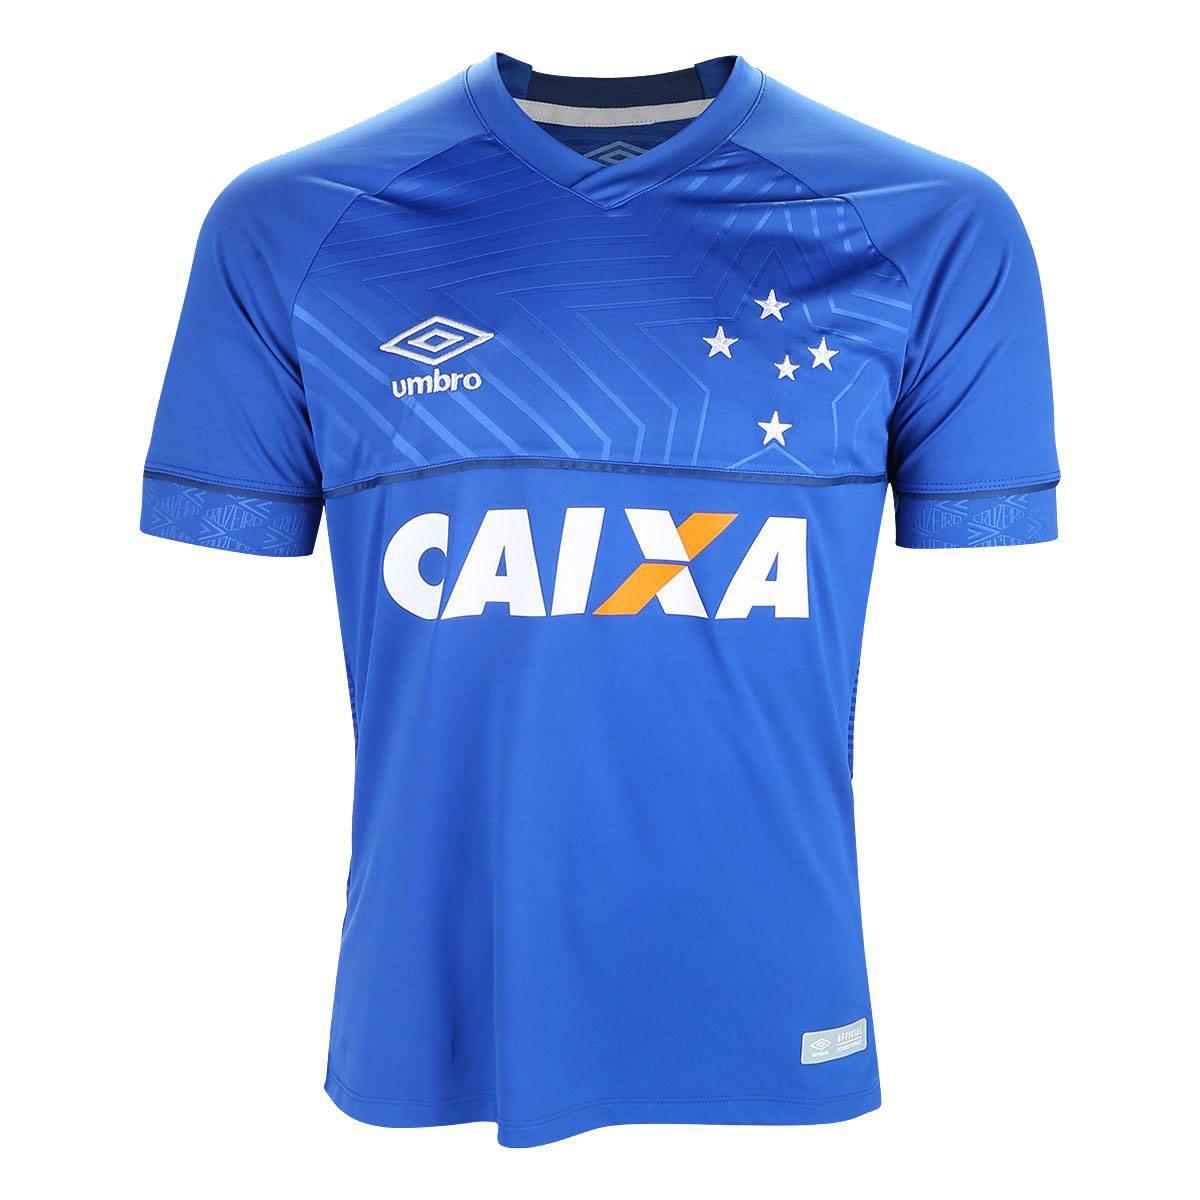 Camisa Cruzeiro I 18/19 s/n° Torcedor Umbro Masculina